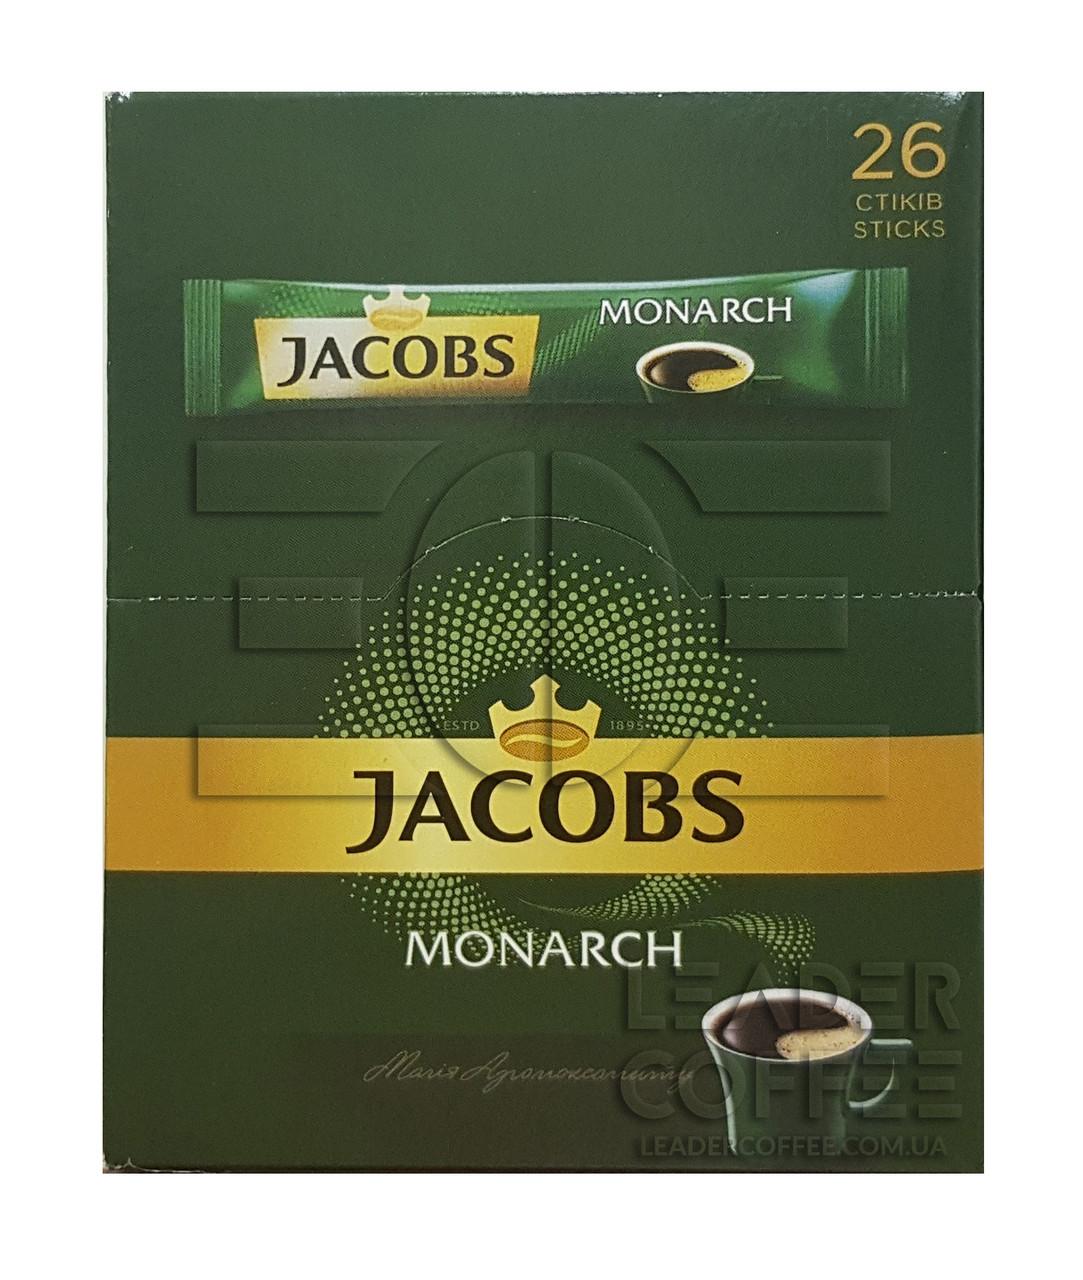 Кофе Jacobs Monarch в стиках 2г(якобс монарх стик 2г)